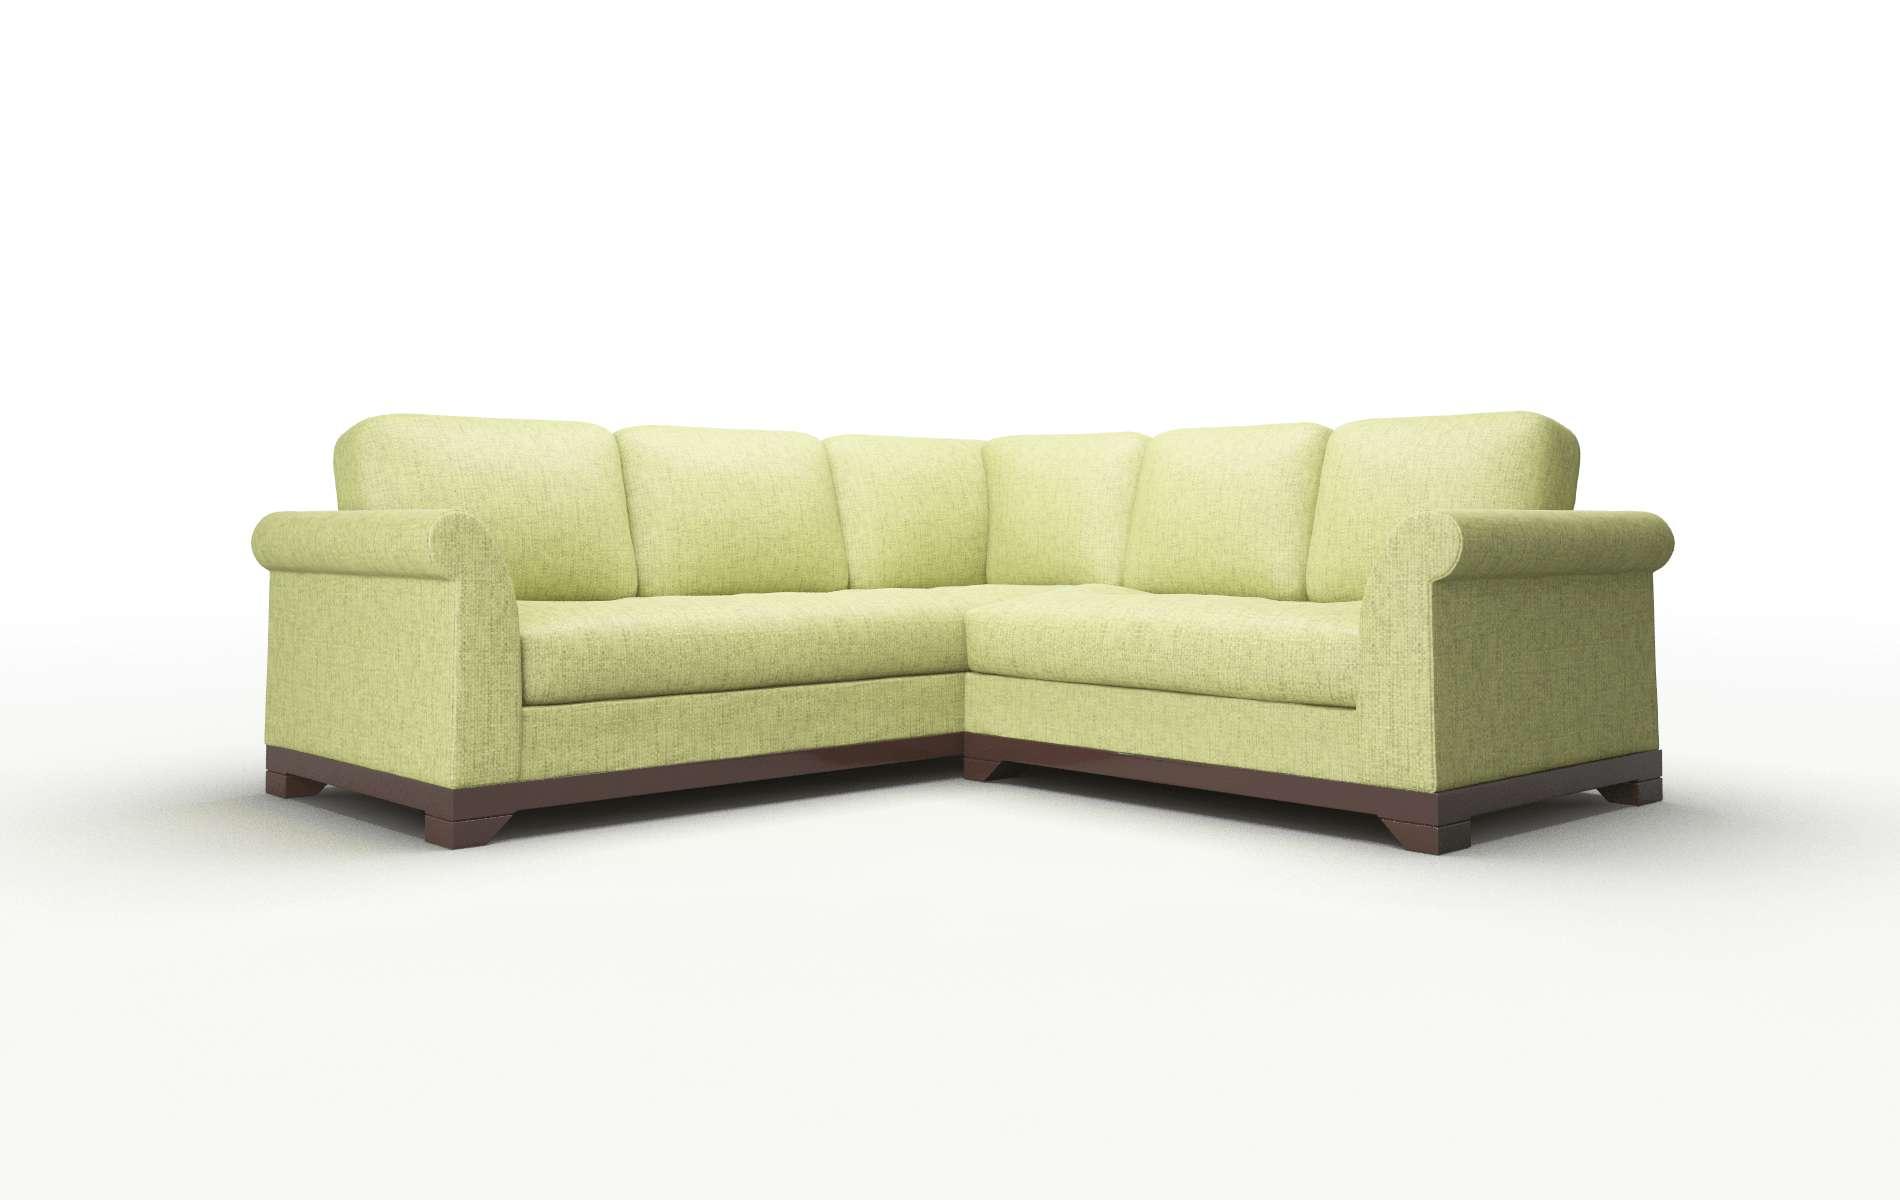 Denver Notion Appletini chair espresso legs